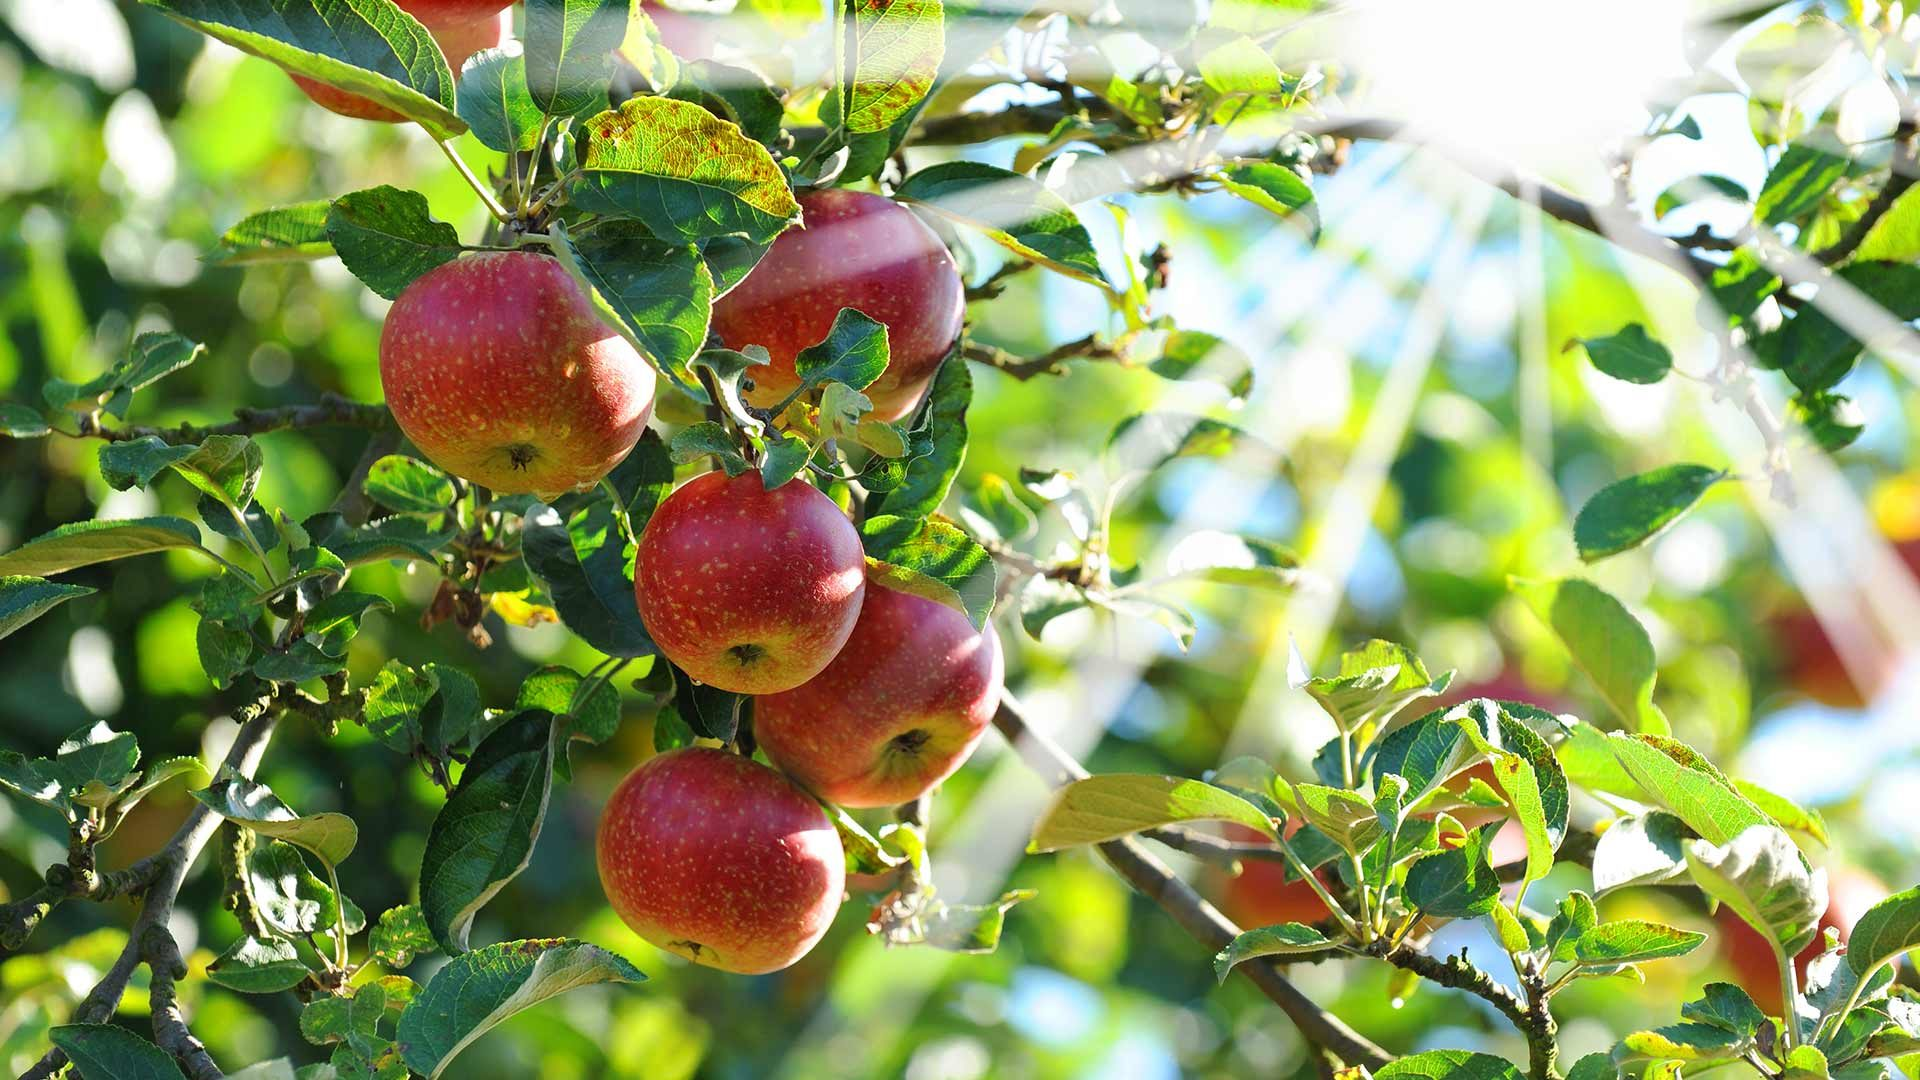 Il paese delle mele – Guida a Plaus